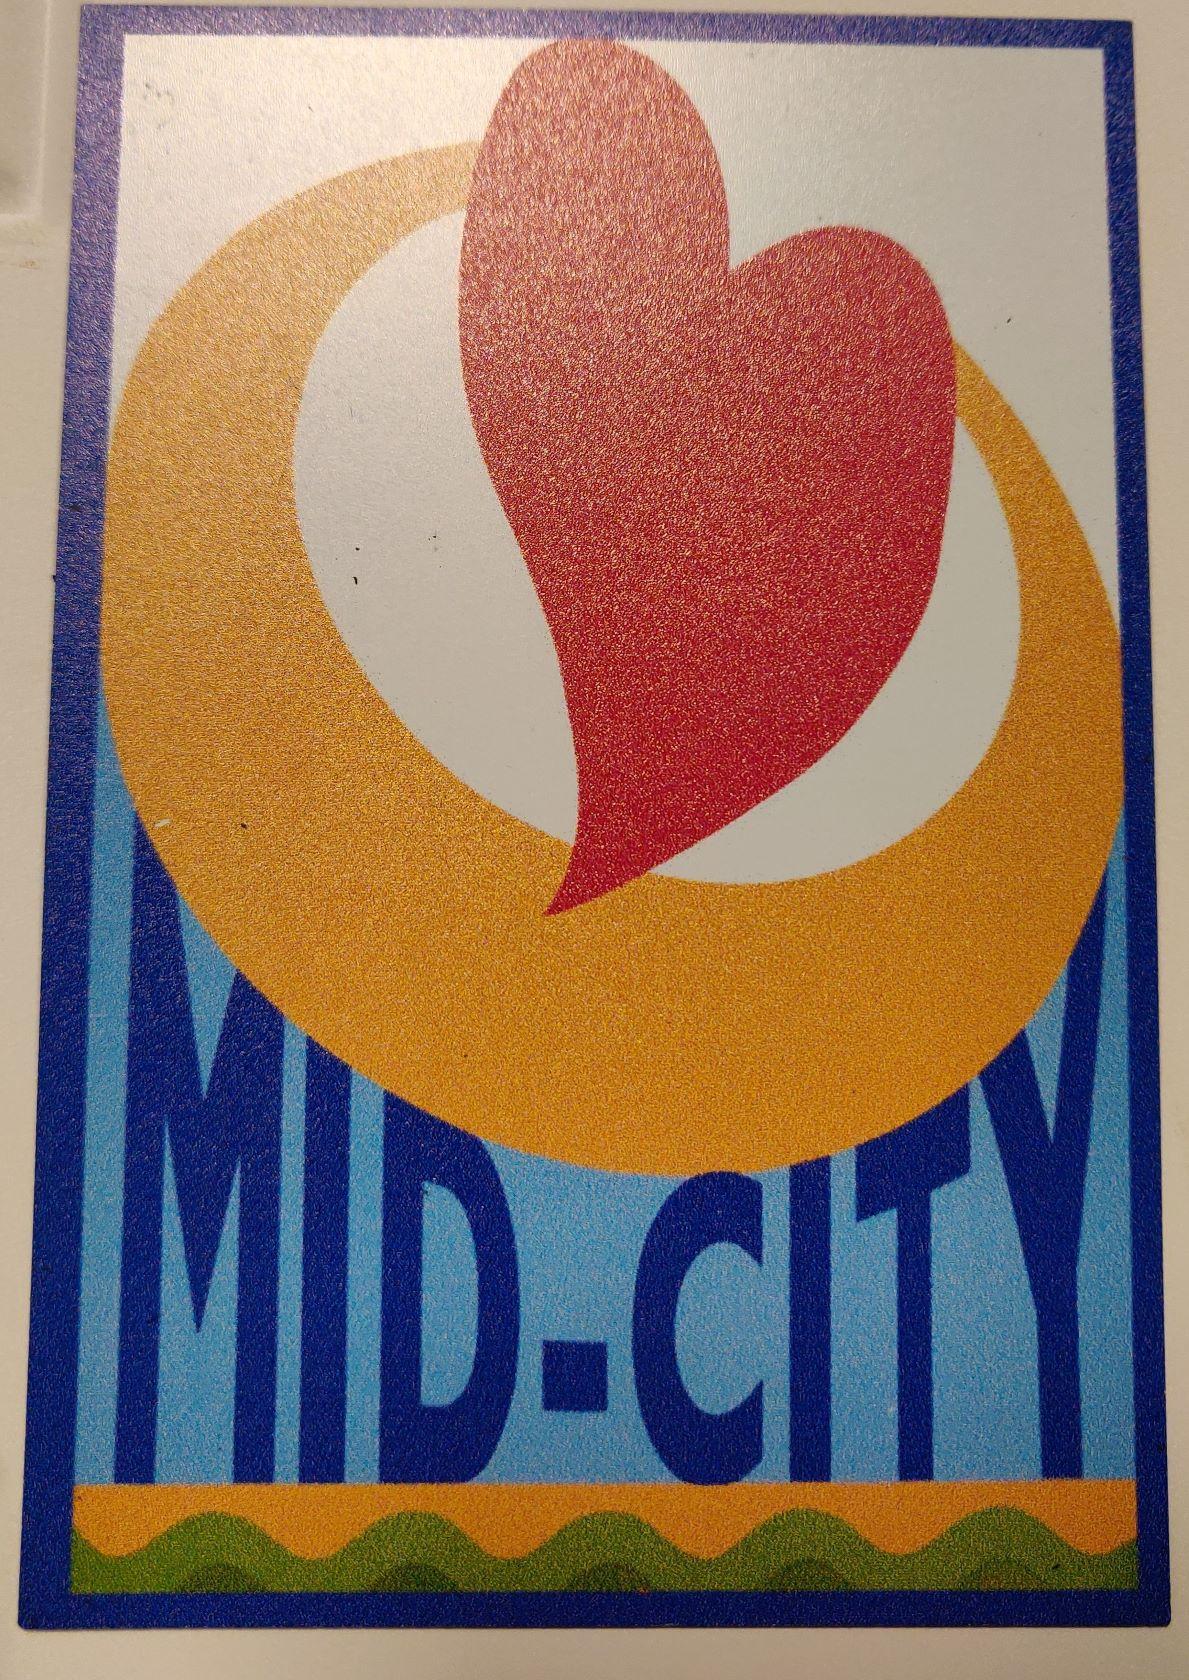 Mid-City Magnet